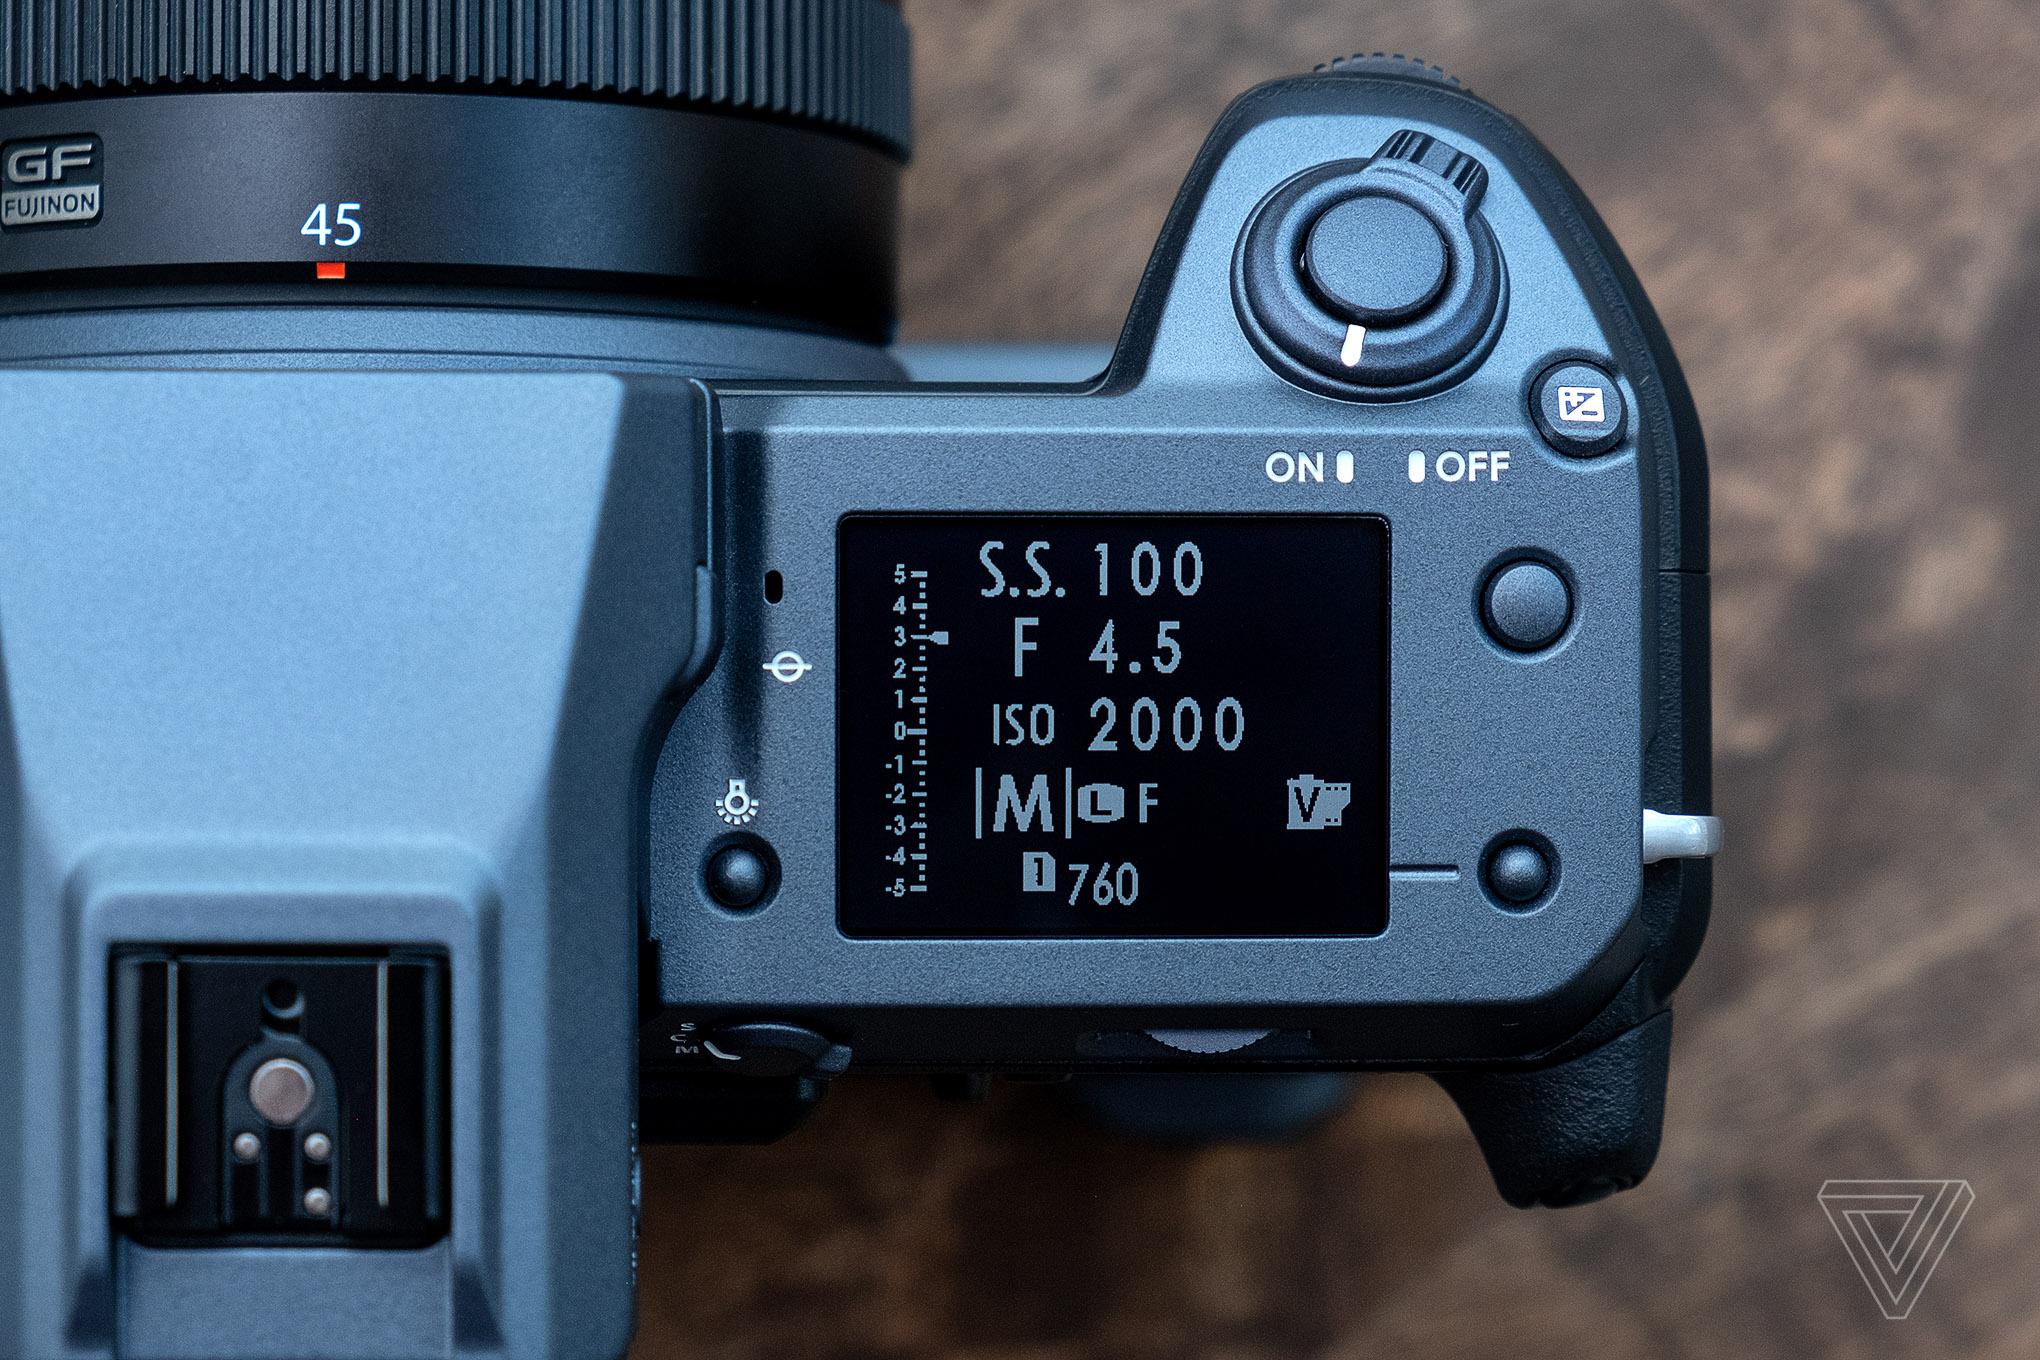 Fujifilm's GFX 100 is a medium format camera that performs